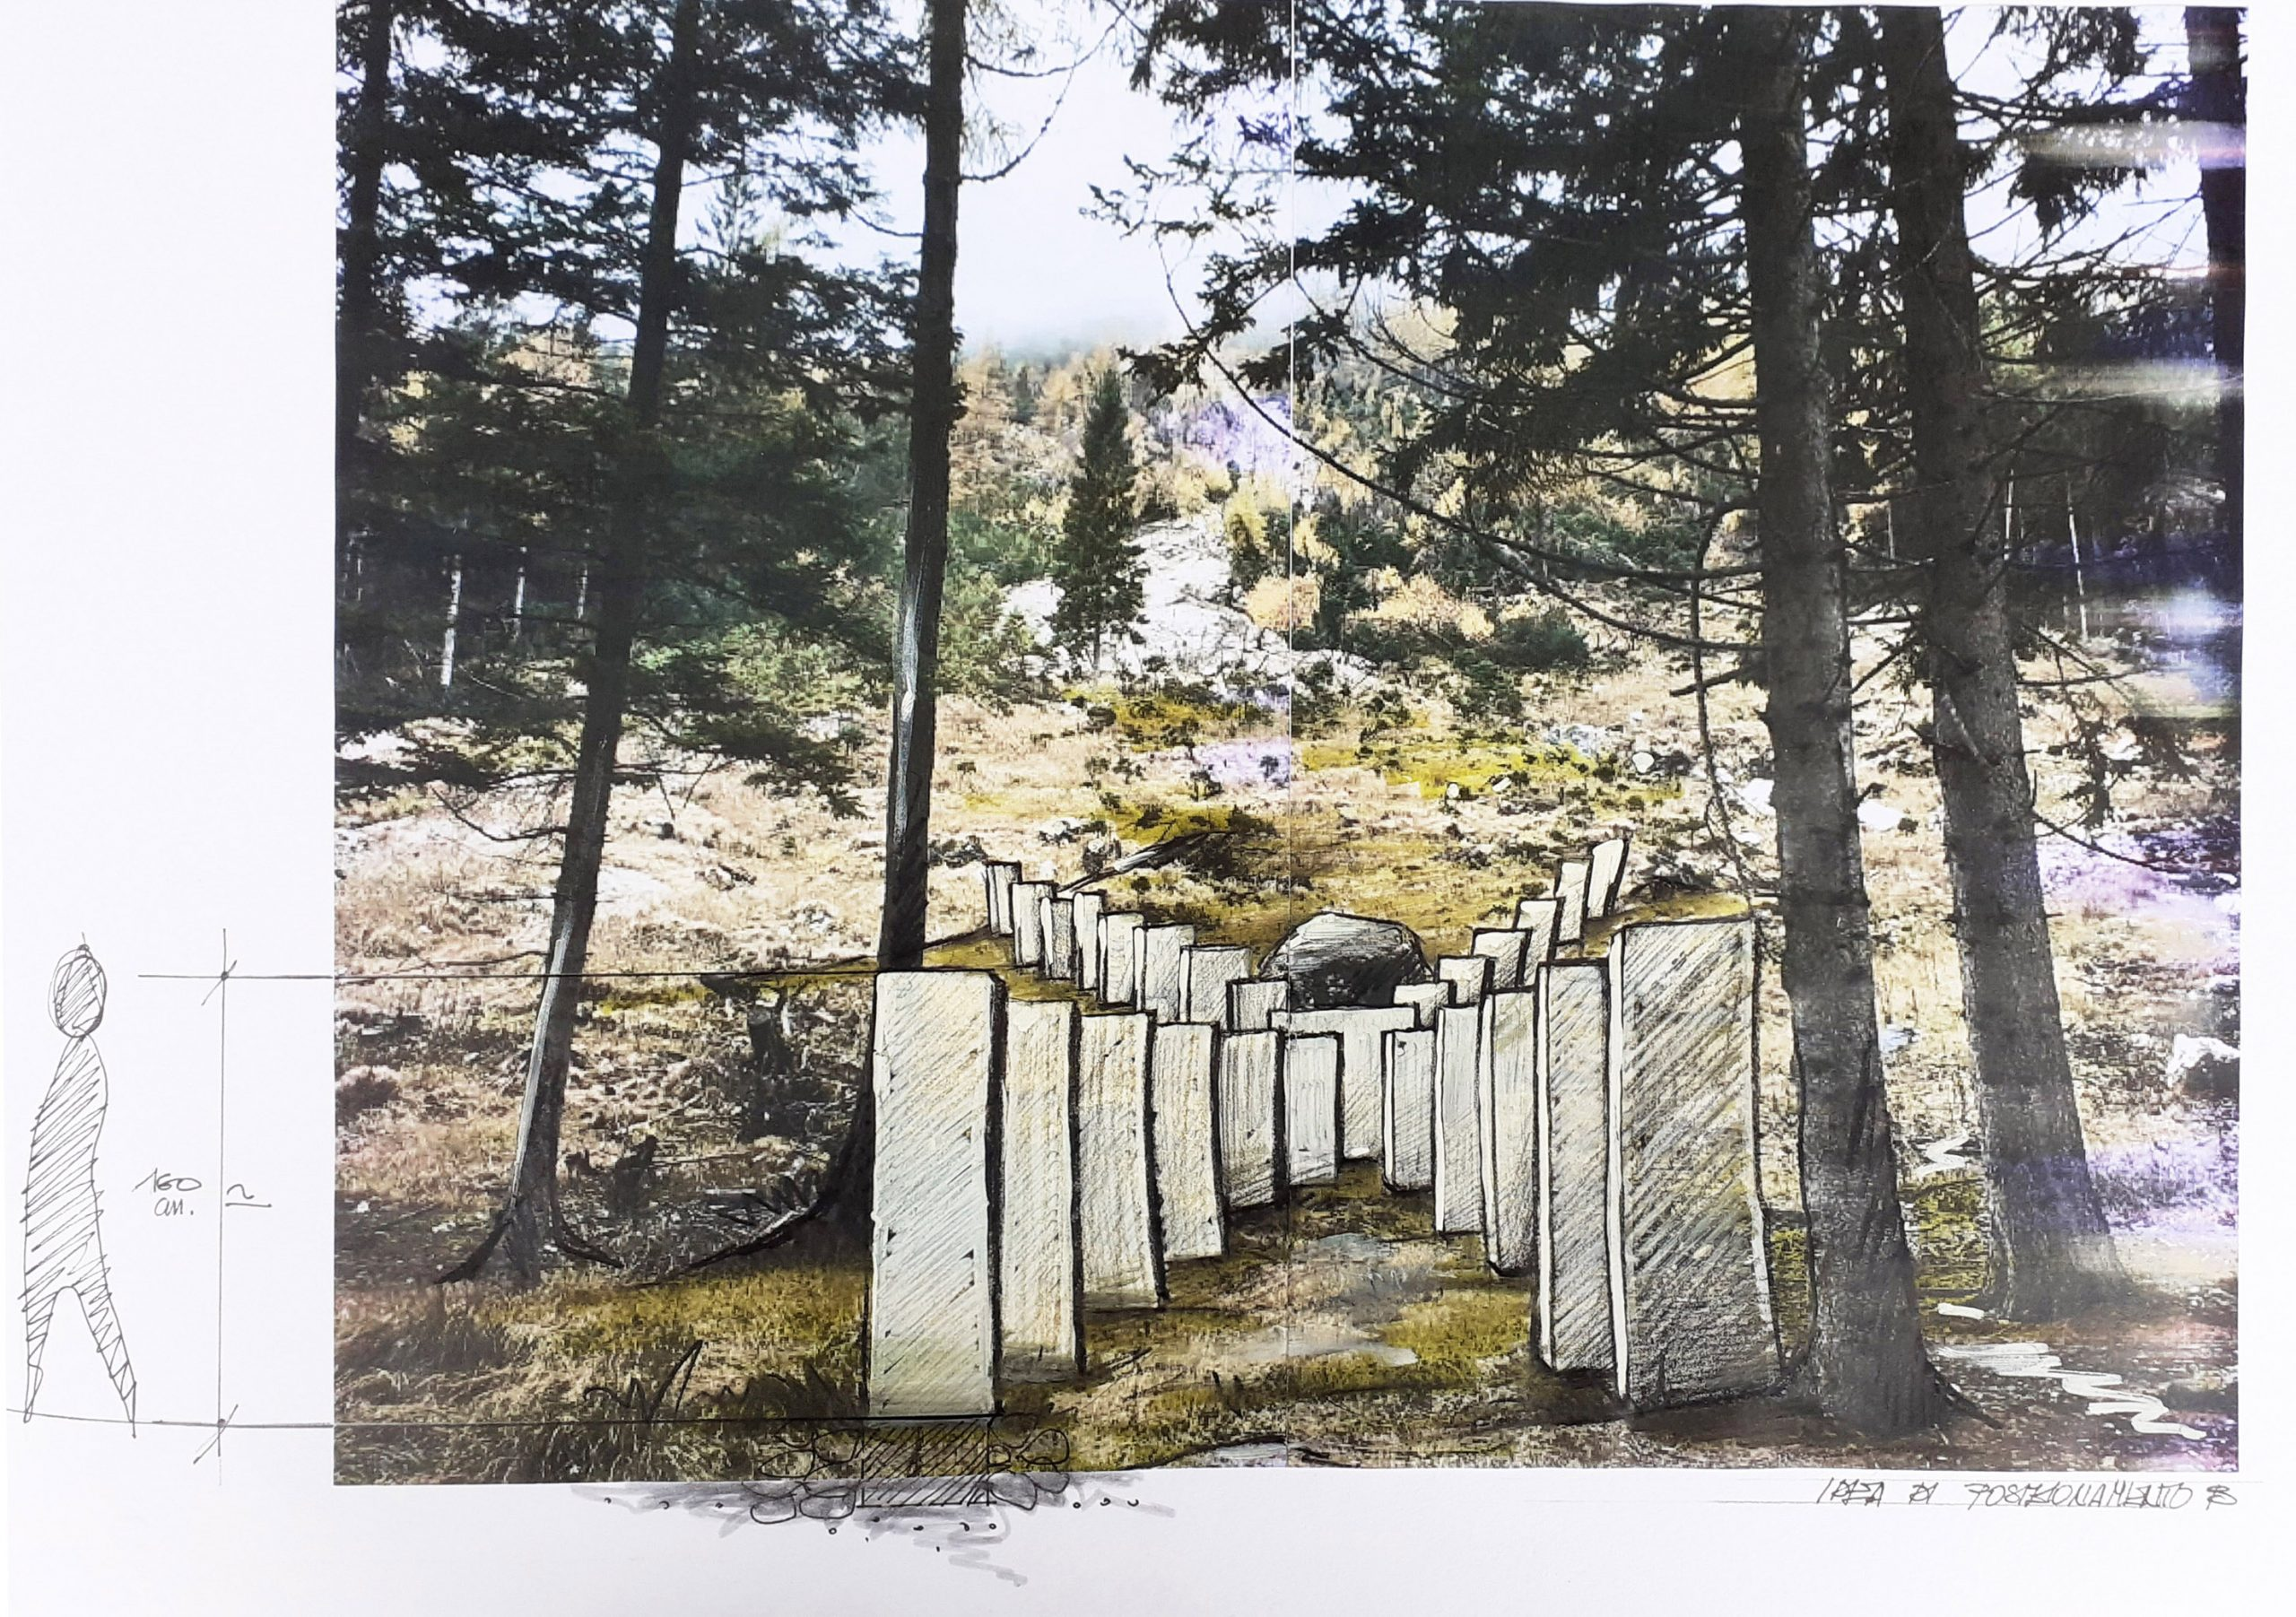 ARCIPELAGO FOSSILE: tra arte e natura a Cortina d'Ampezzo